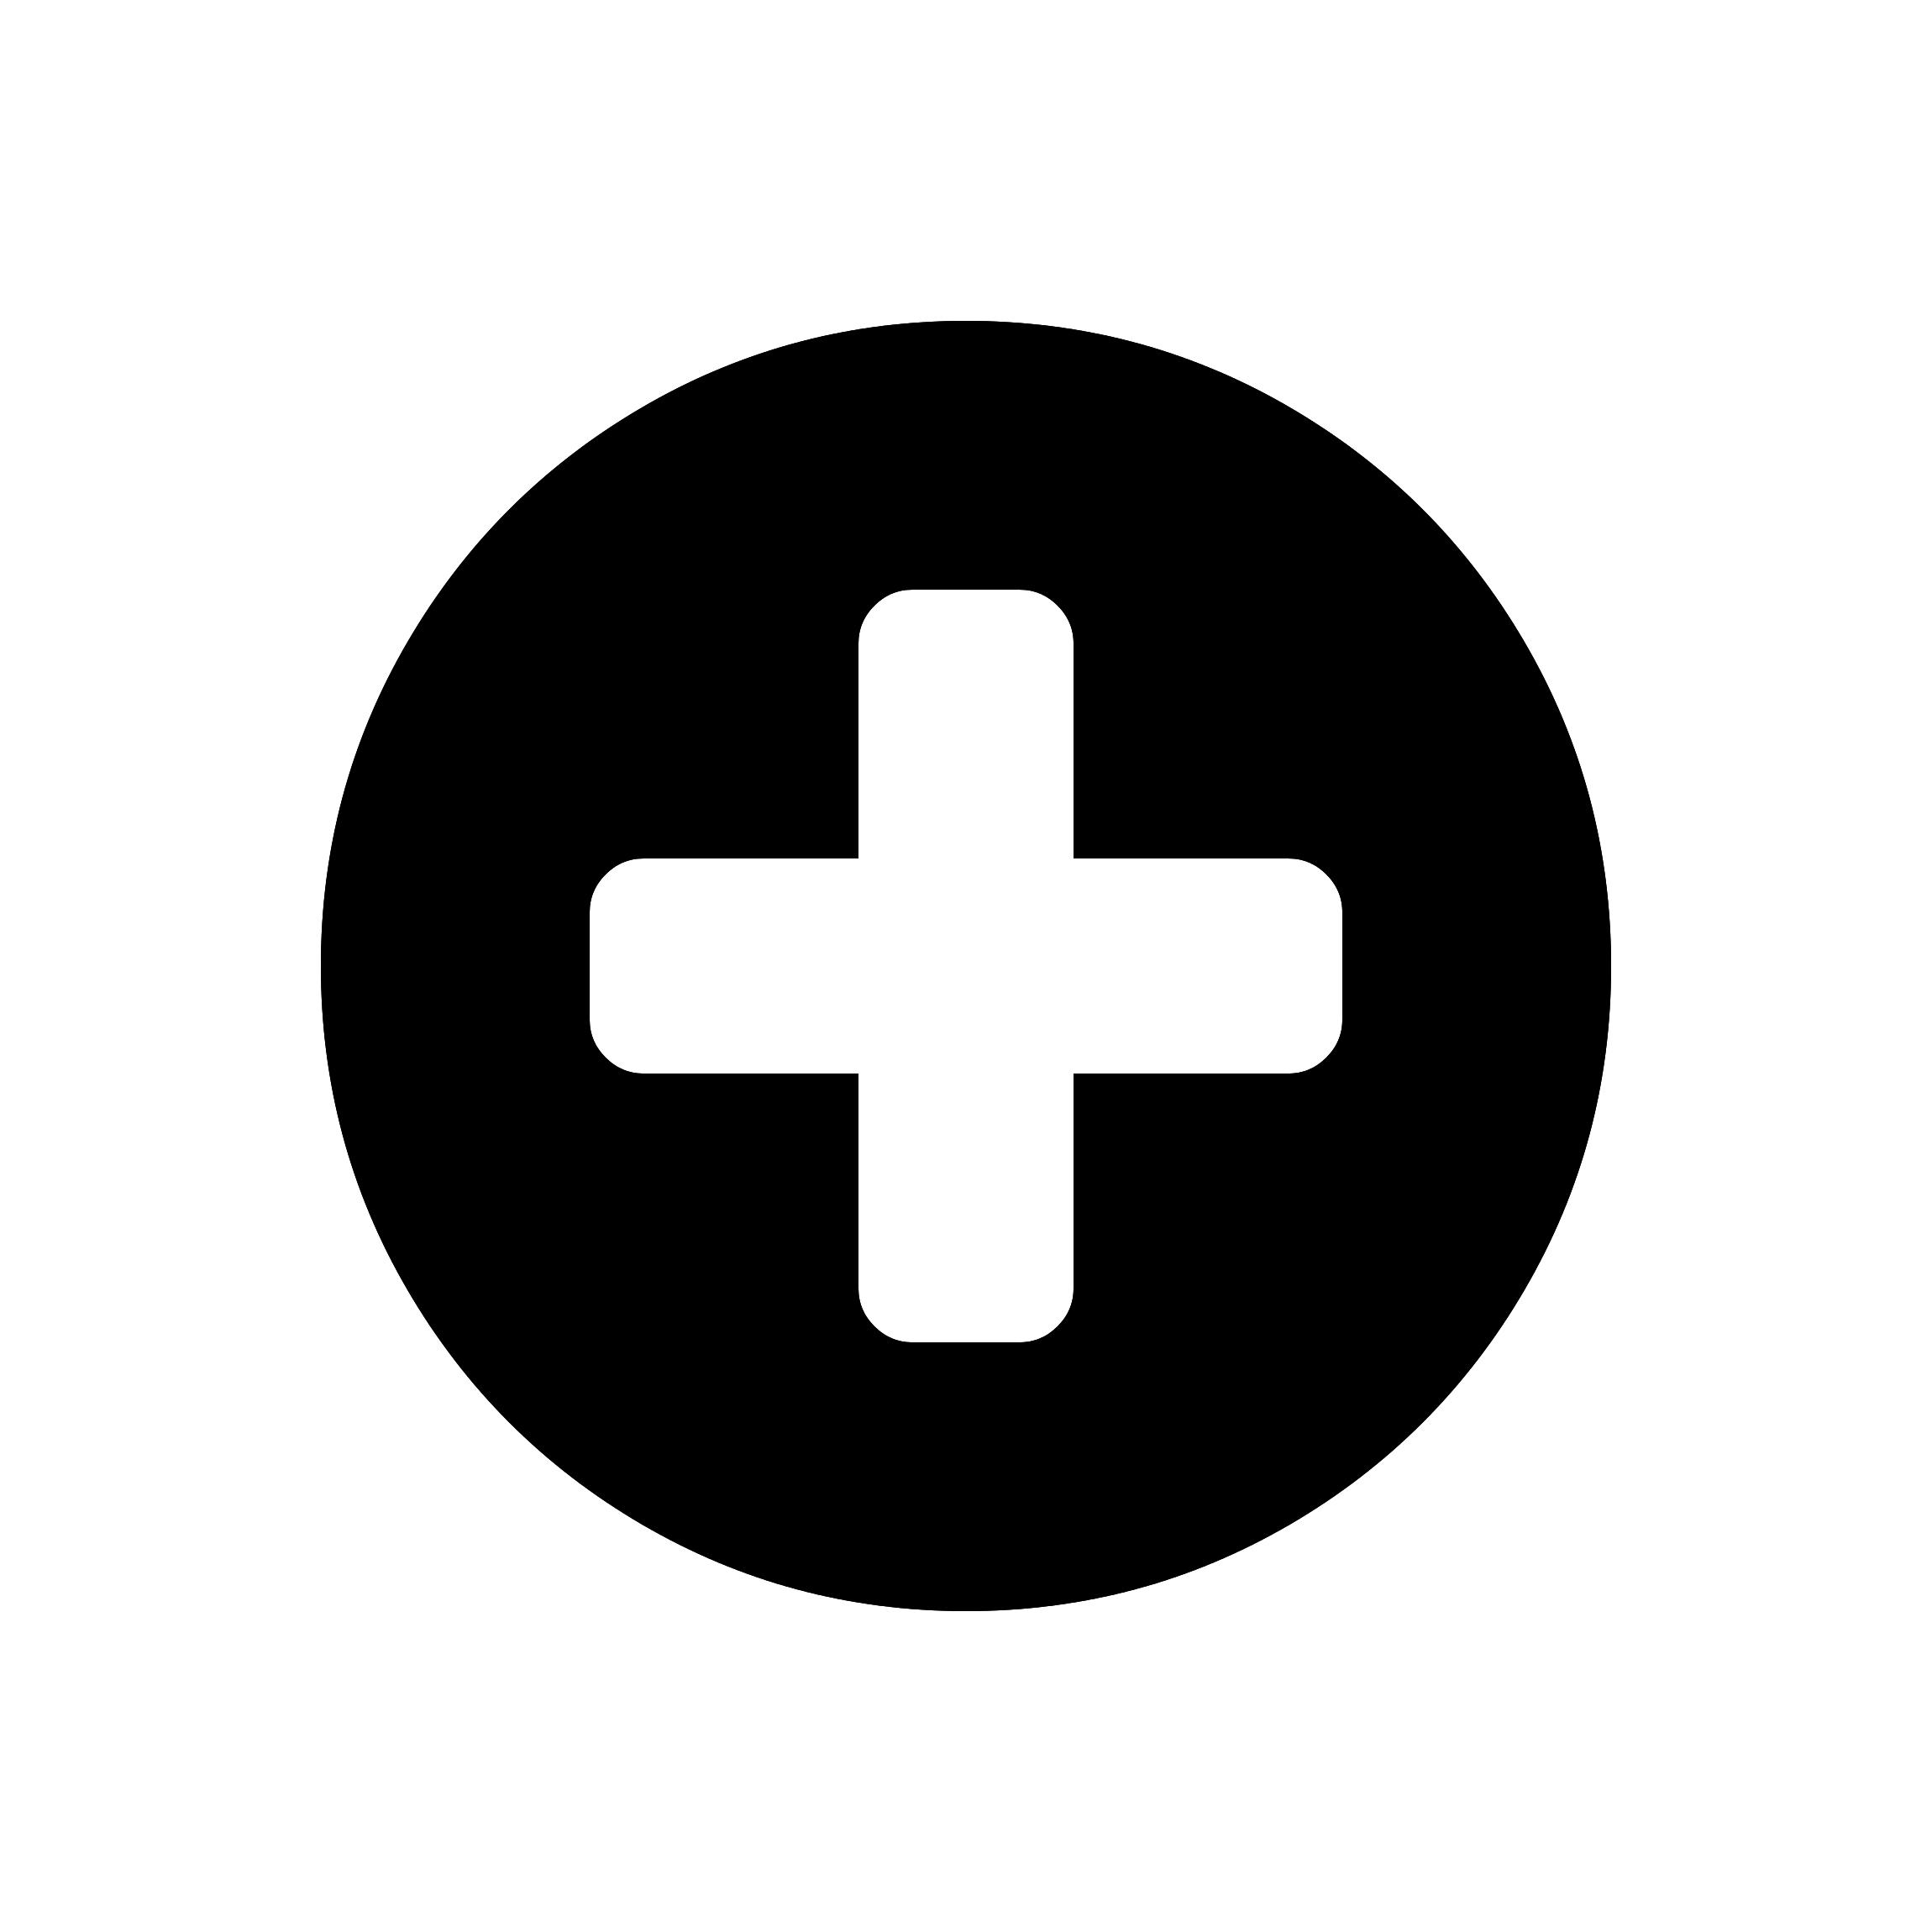 data/images/plus-circle.png